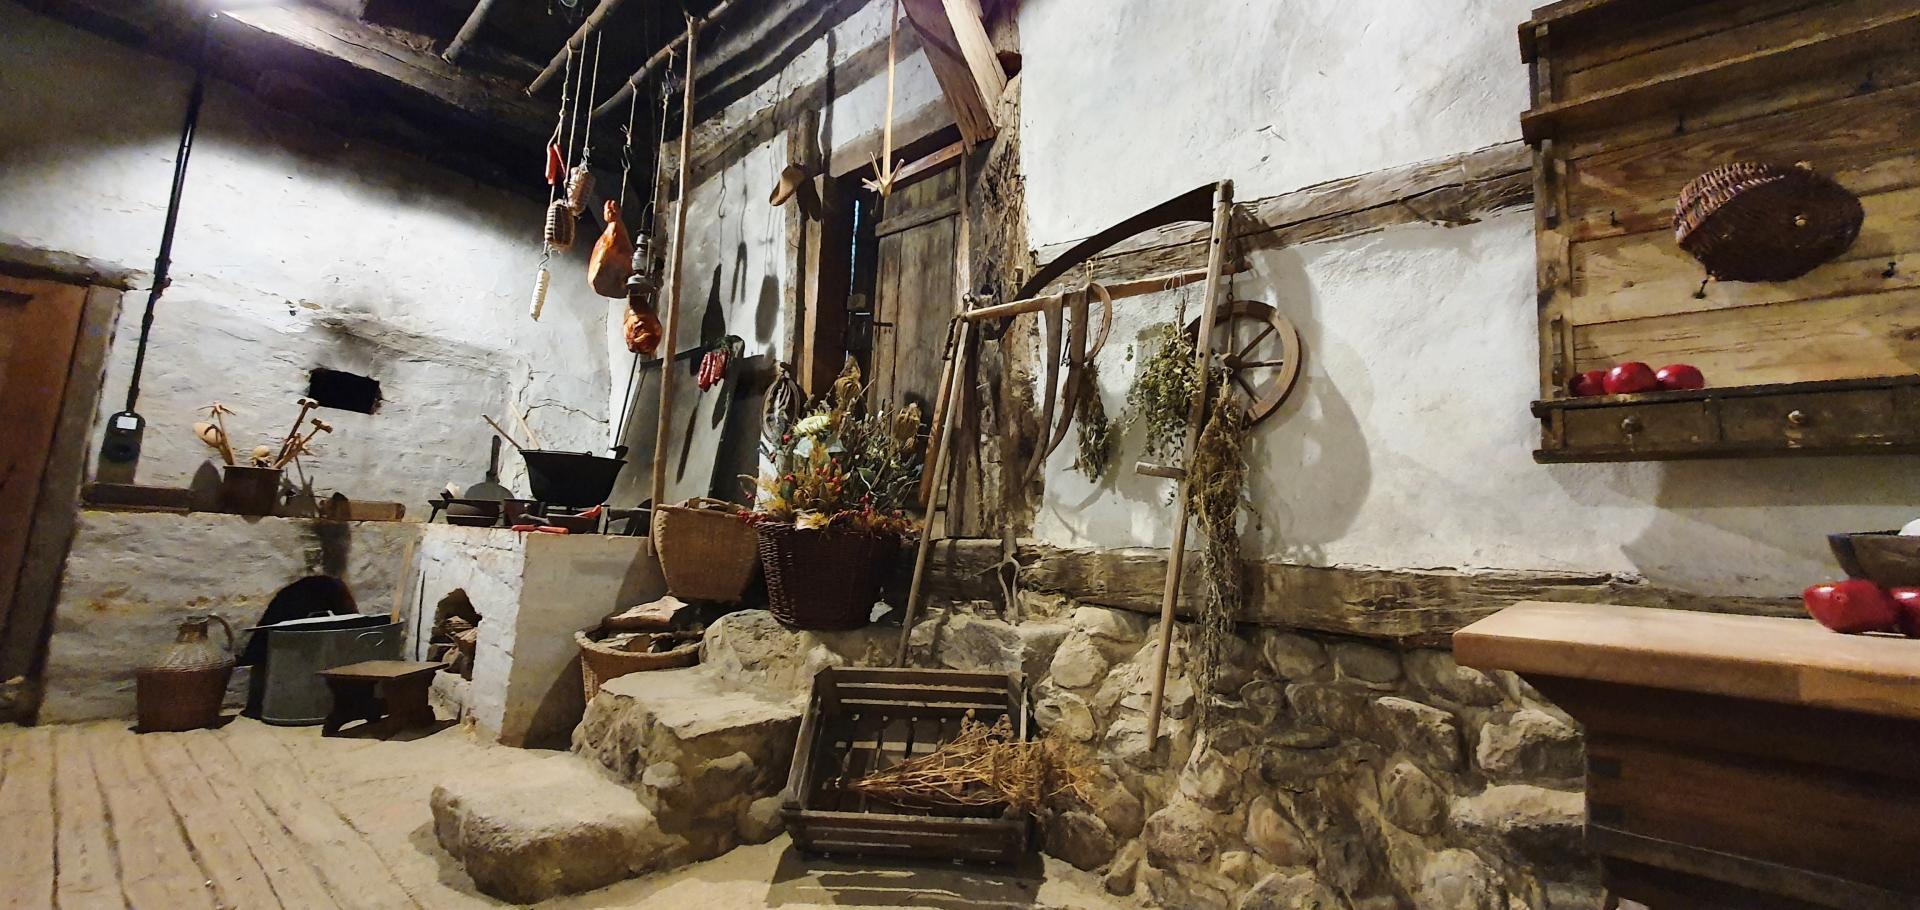 Ältestes Haus Küche